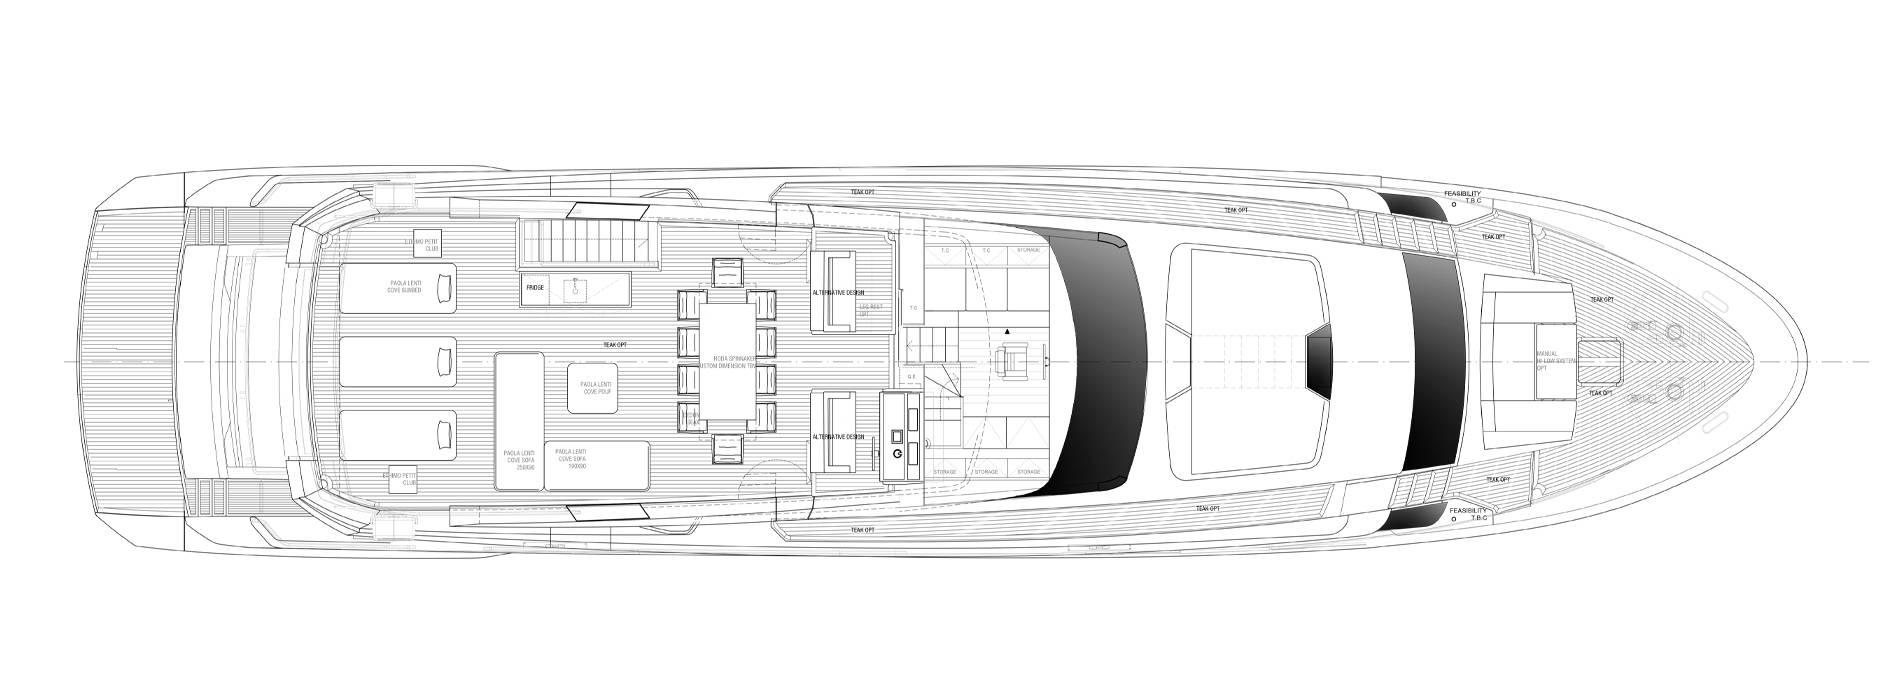 Sanlorenzo Yachts SL102A-746 Флайбридж